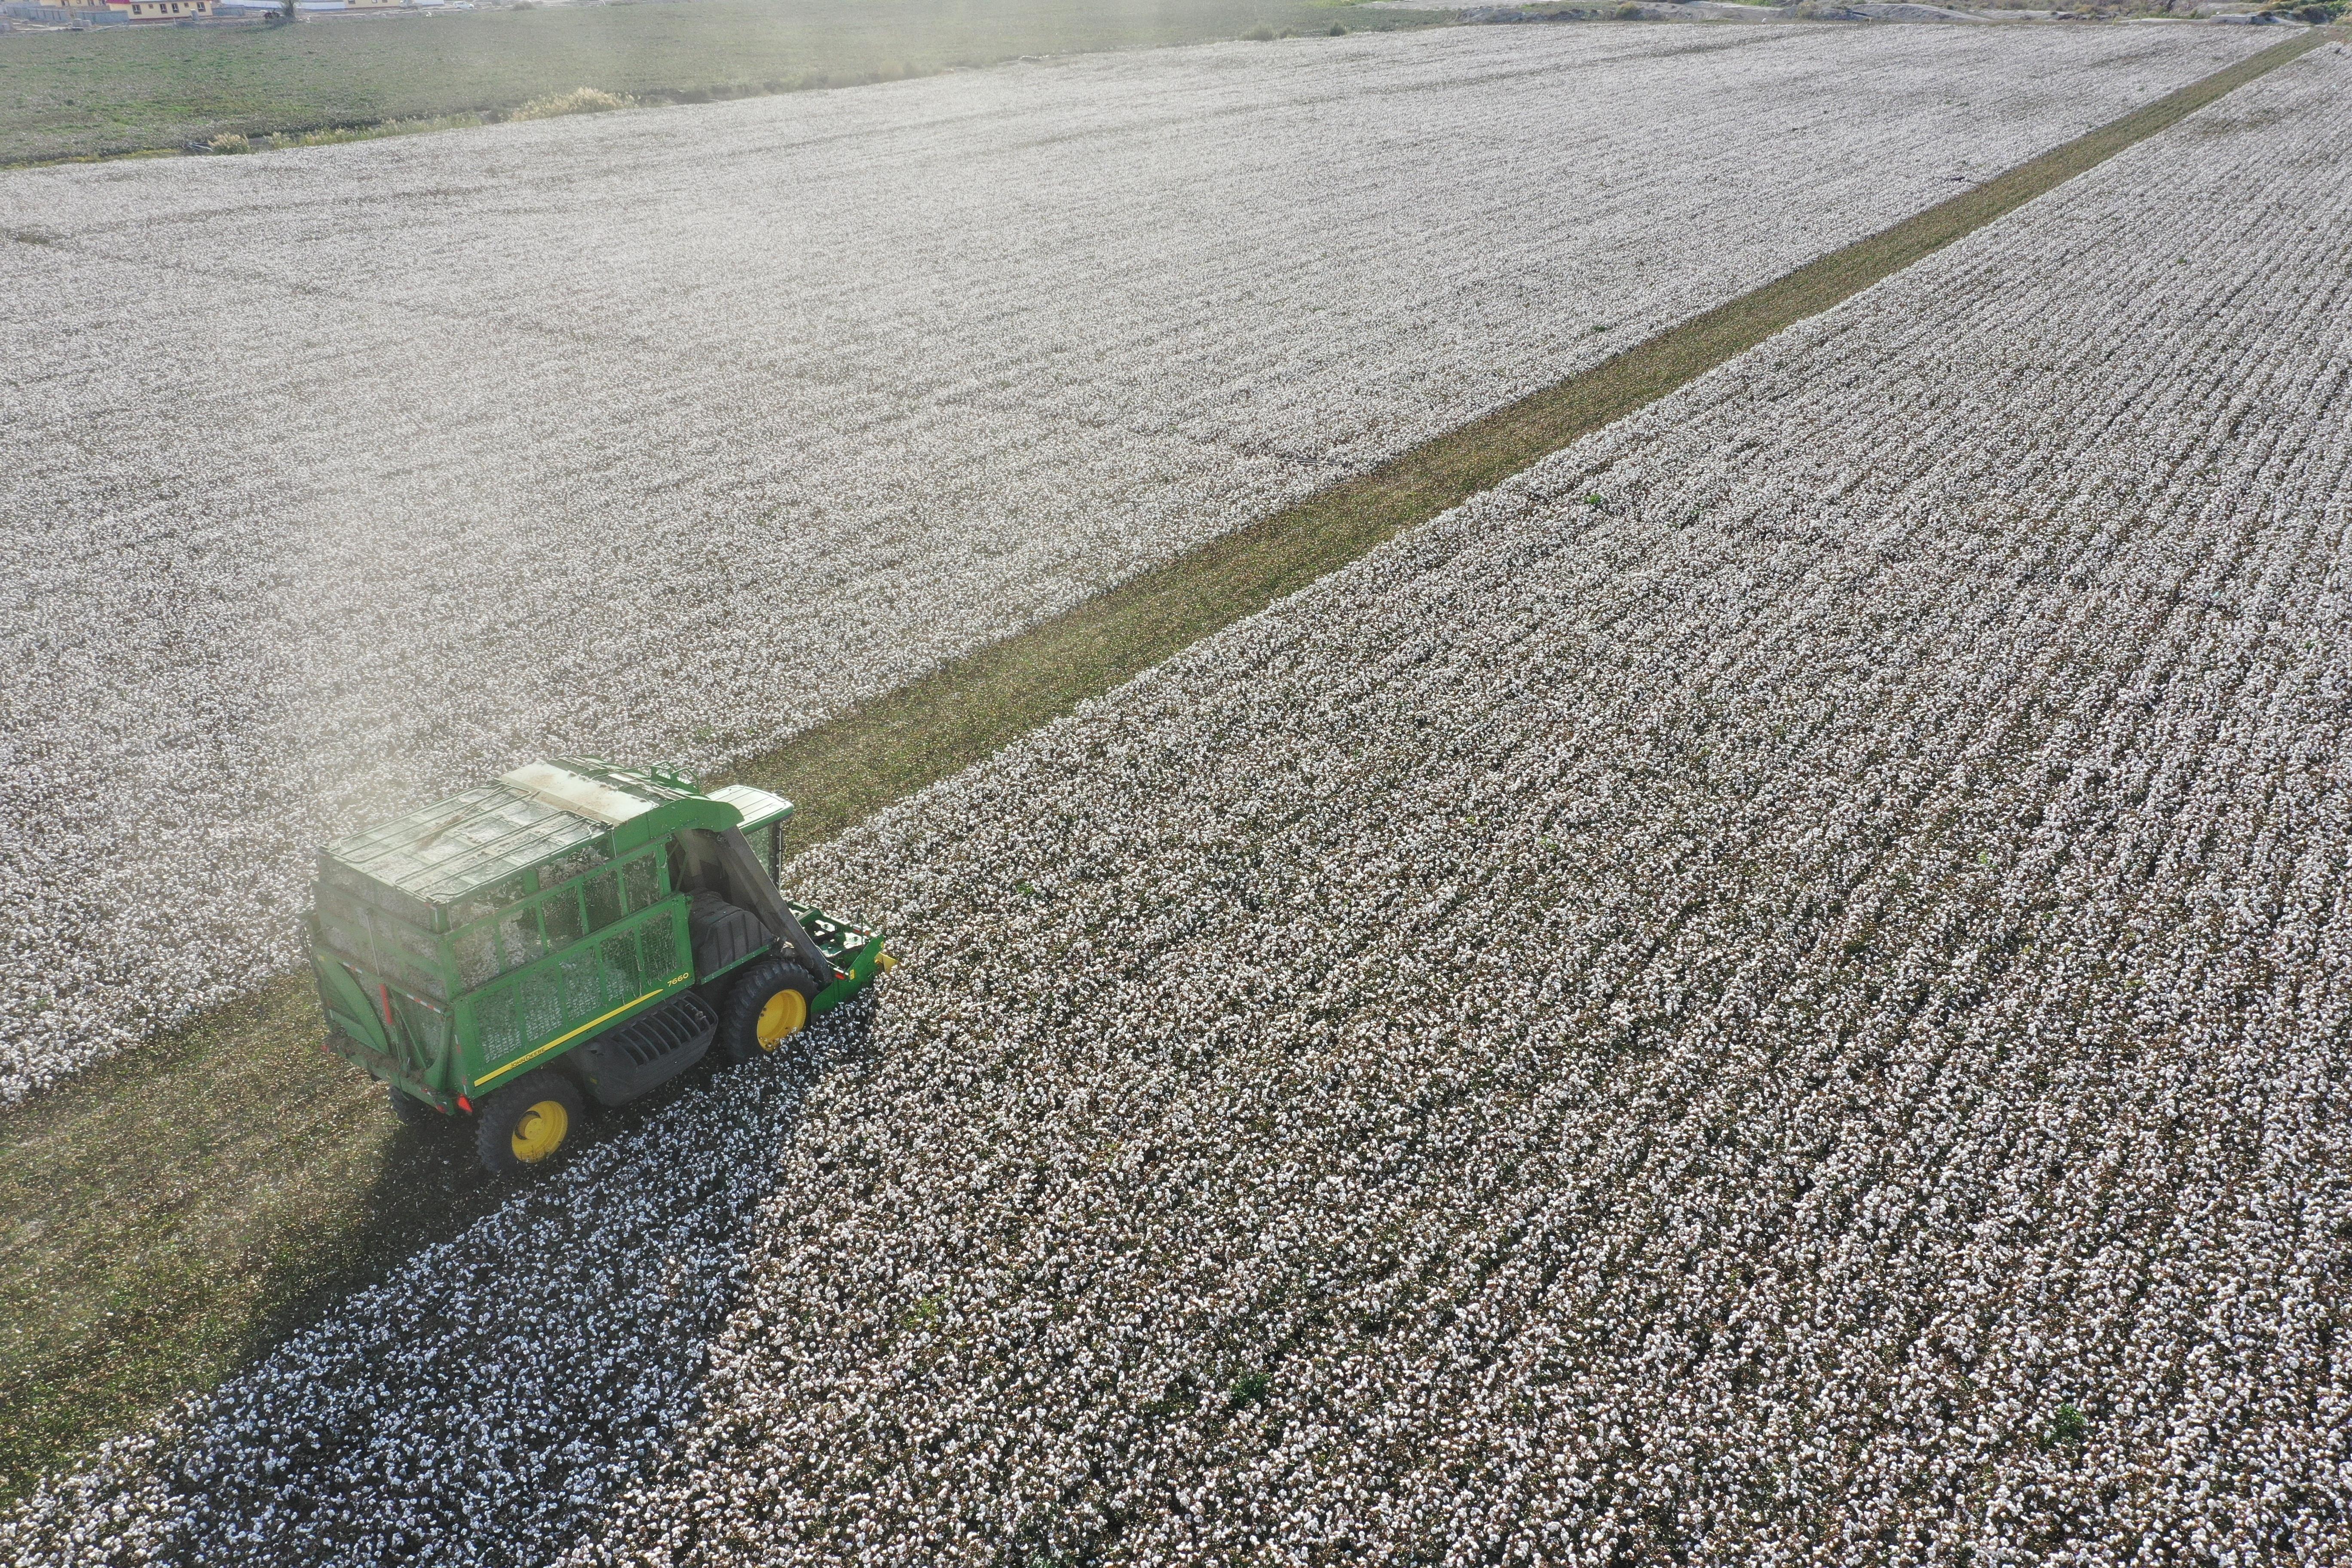 Cotton, Xinjiang, farming, government, trade, sustainability, human rights